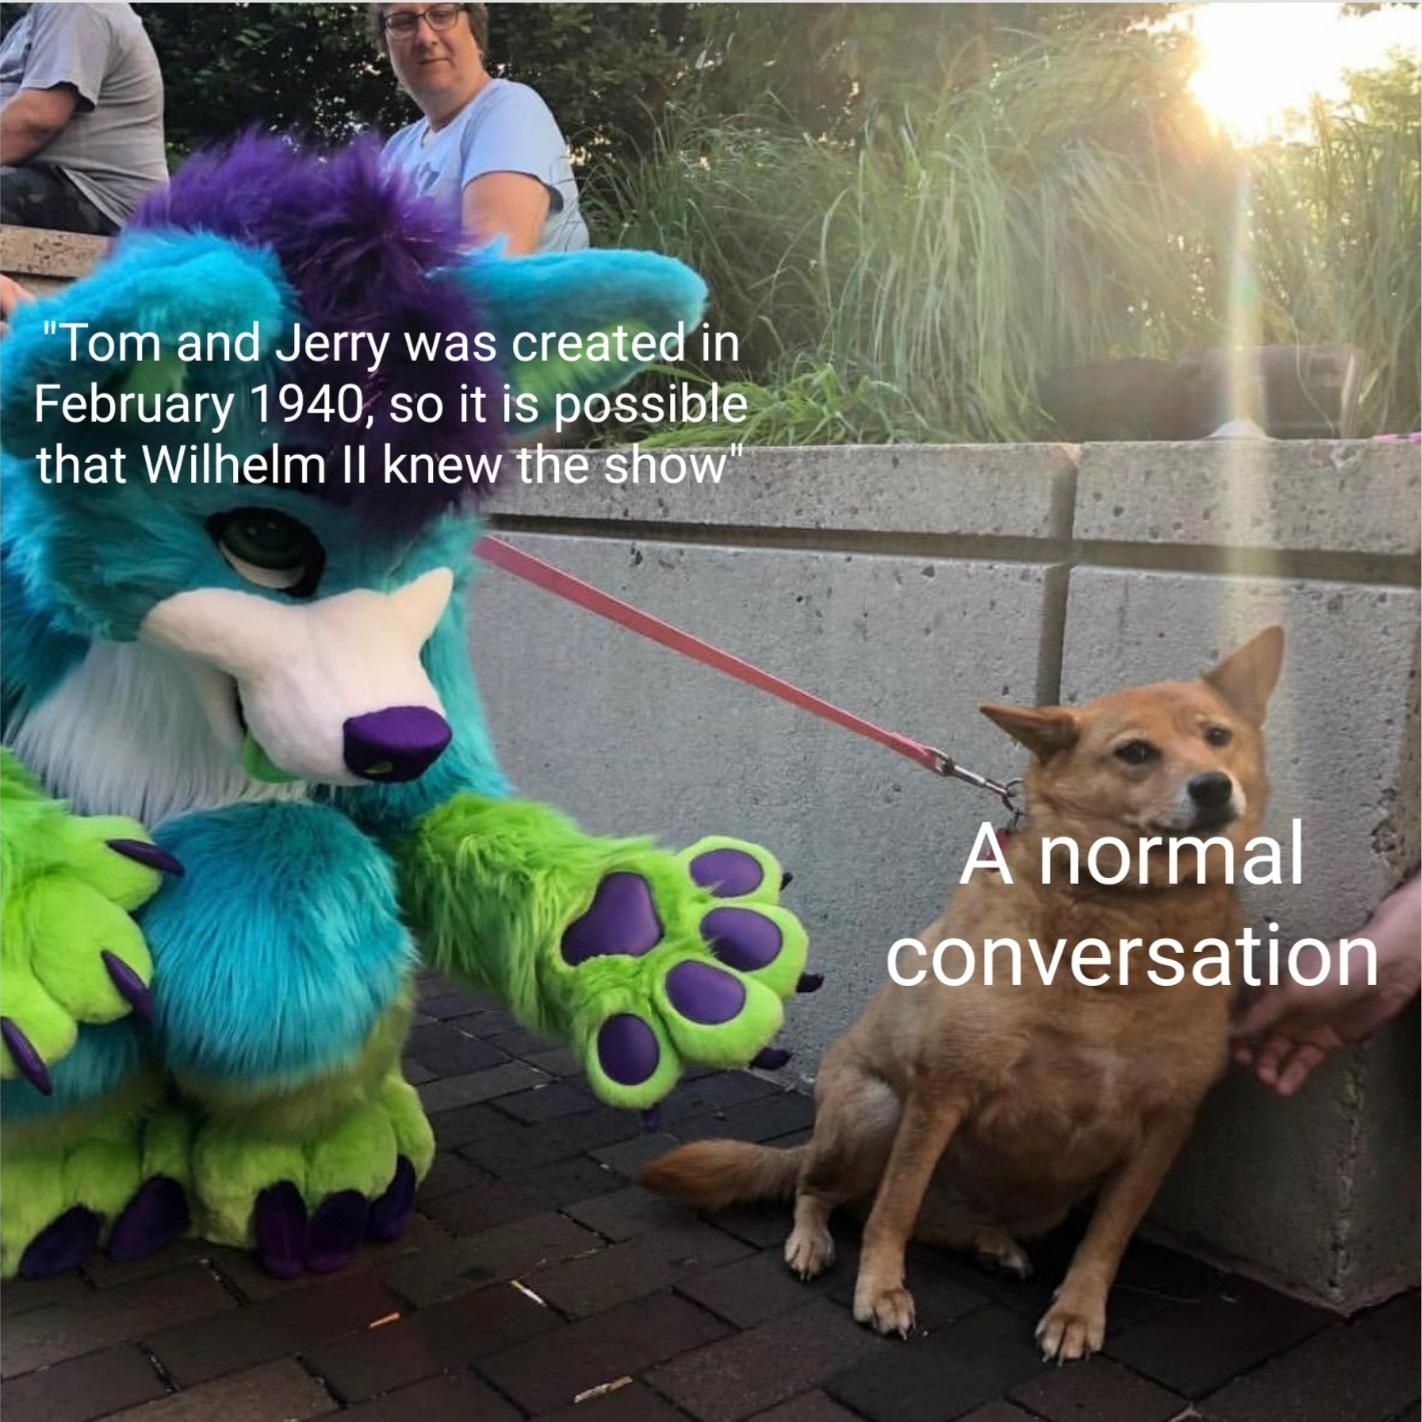 Wilhelm II might knew about it